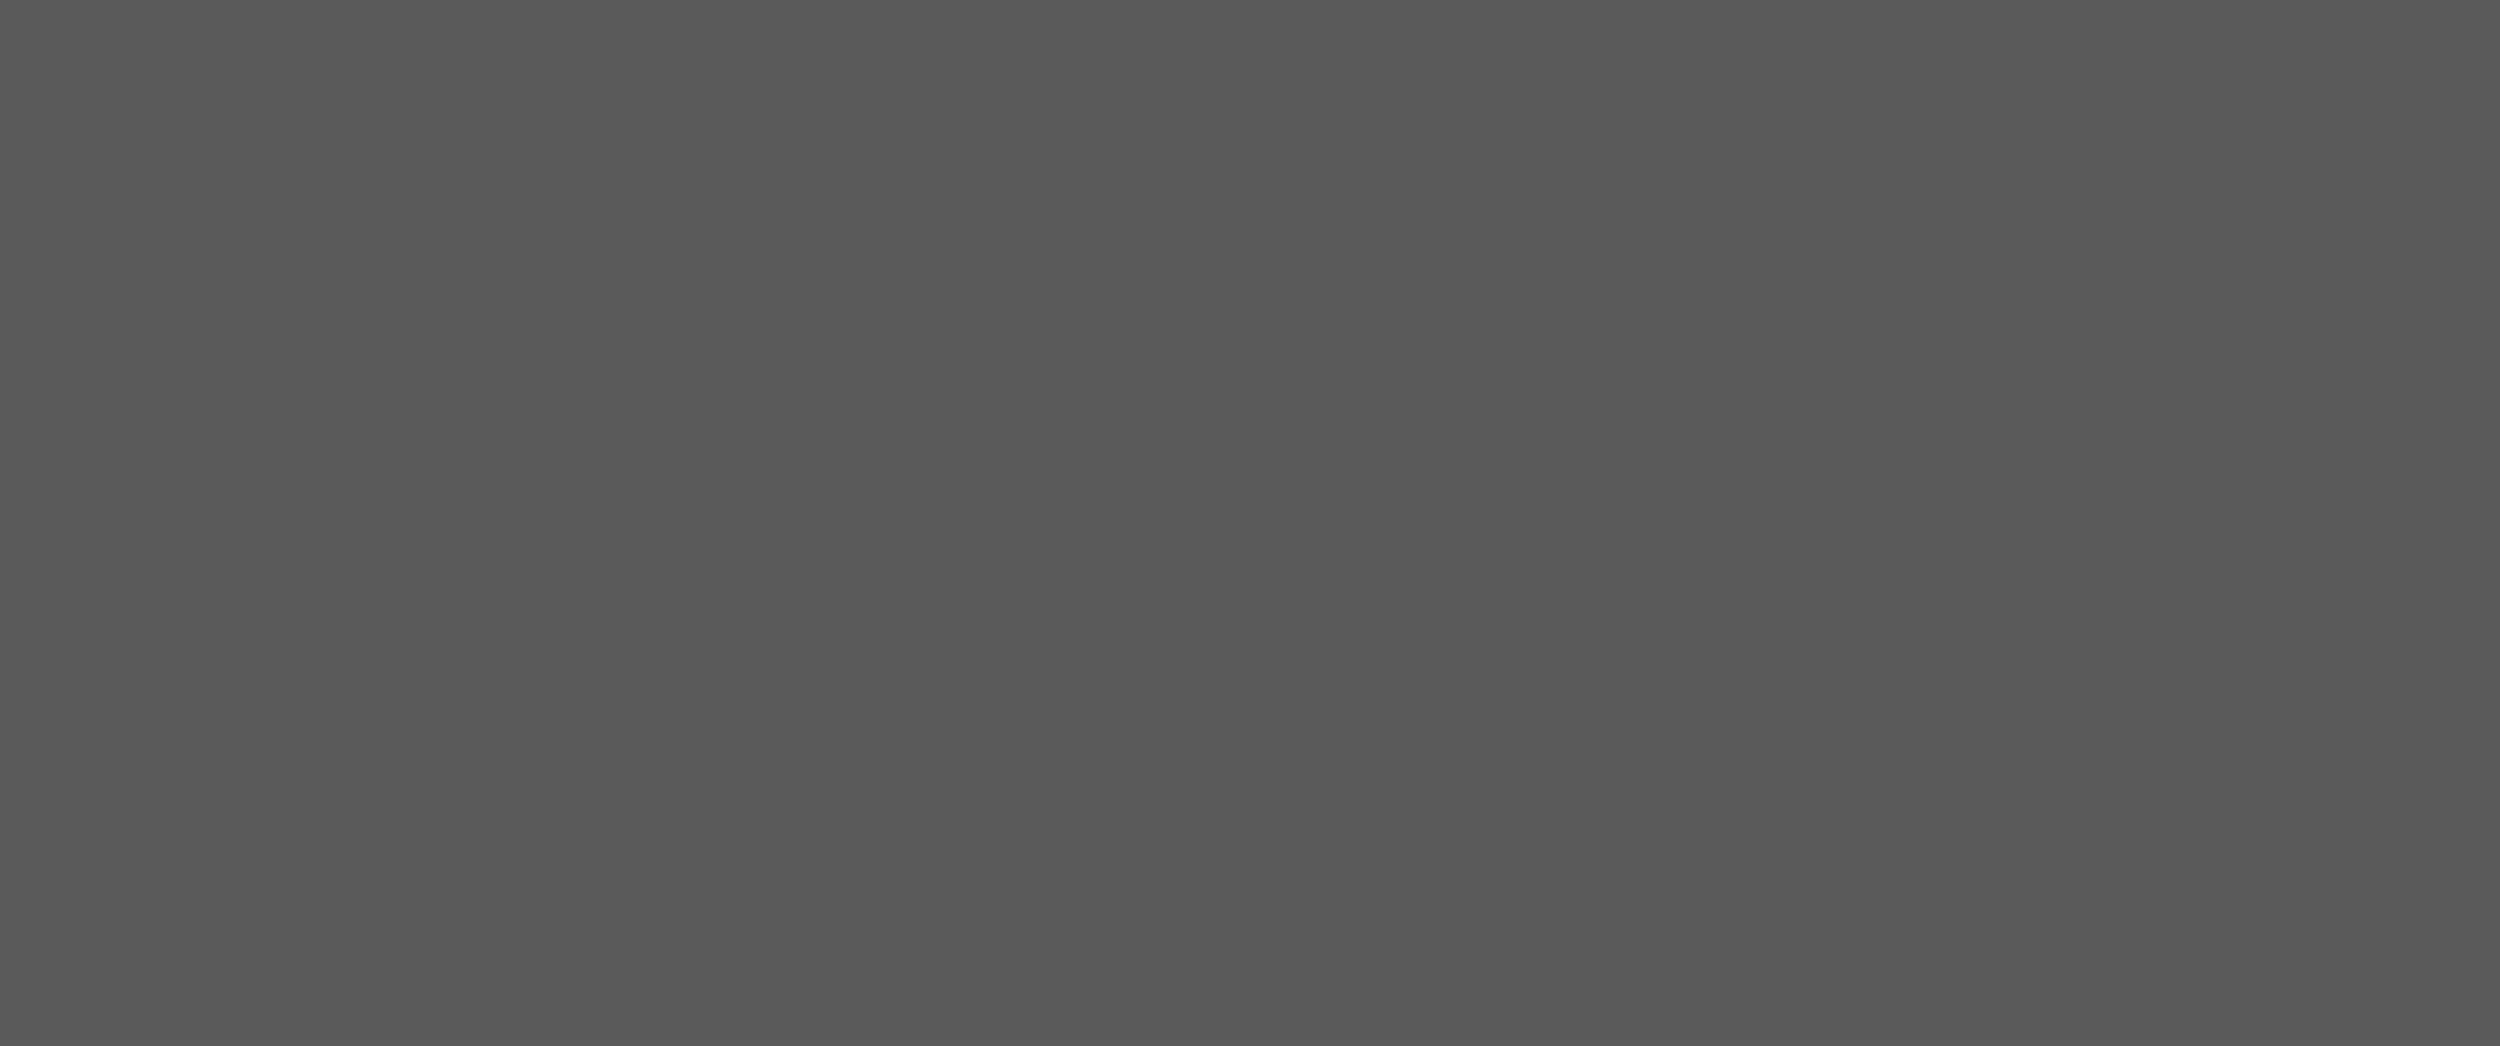 MICROSOFT AZURE -